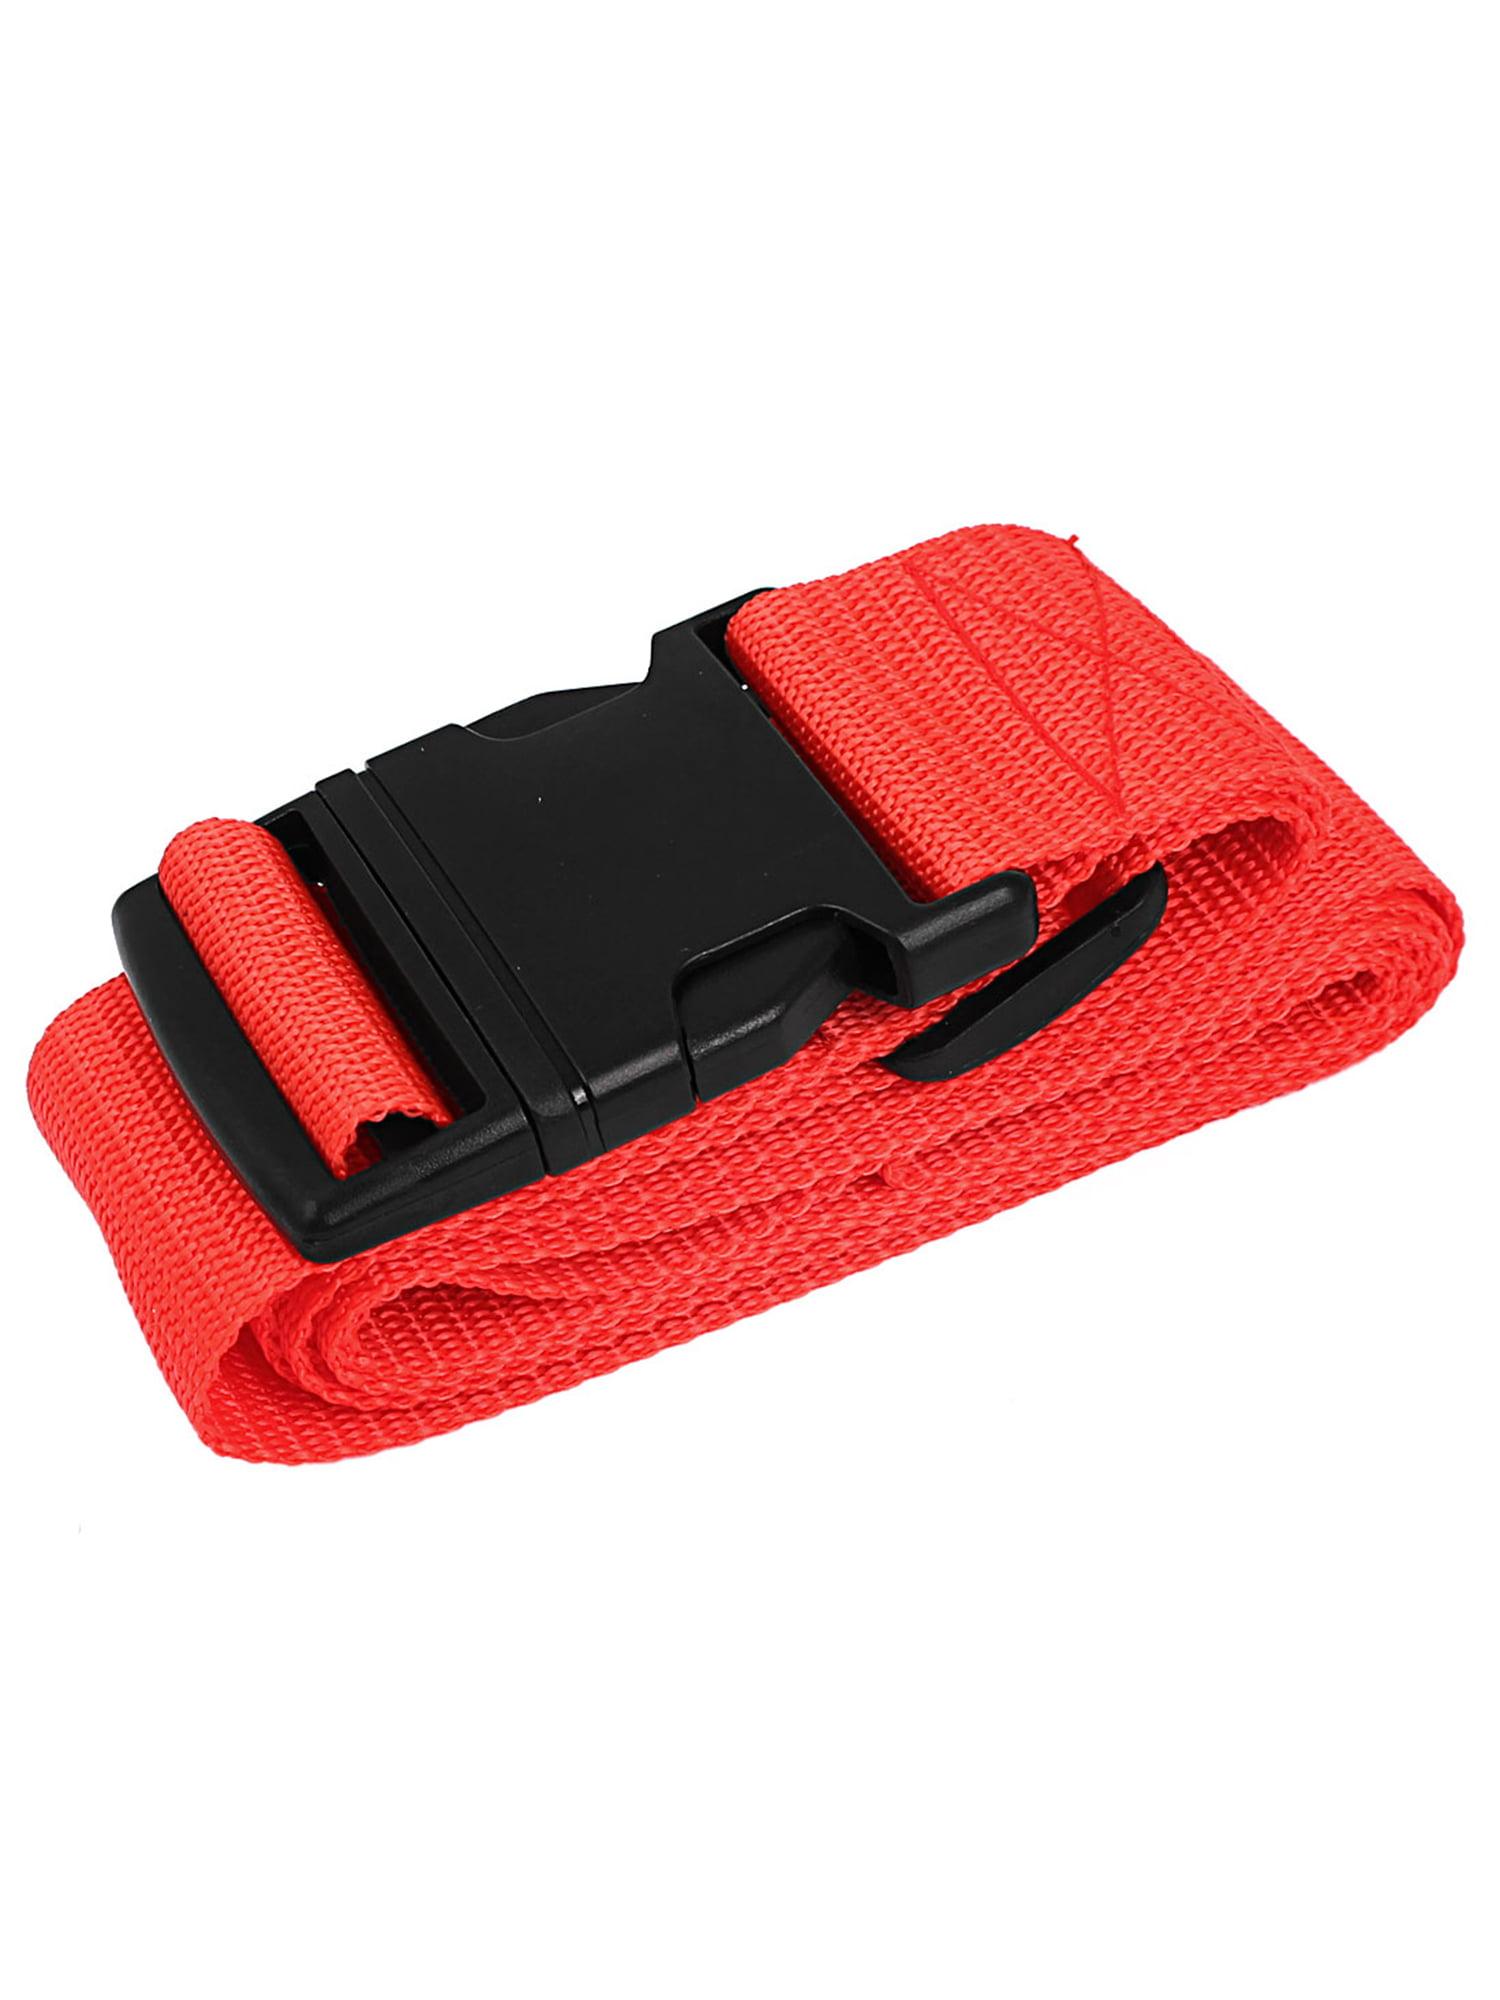 Travel Accessory Tag Pocket Buckle Strap Suitcase Luggage Belt Orange 2M Girth